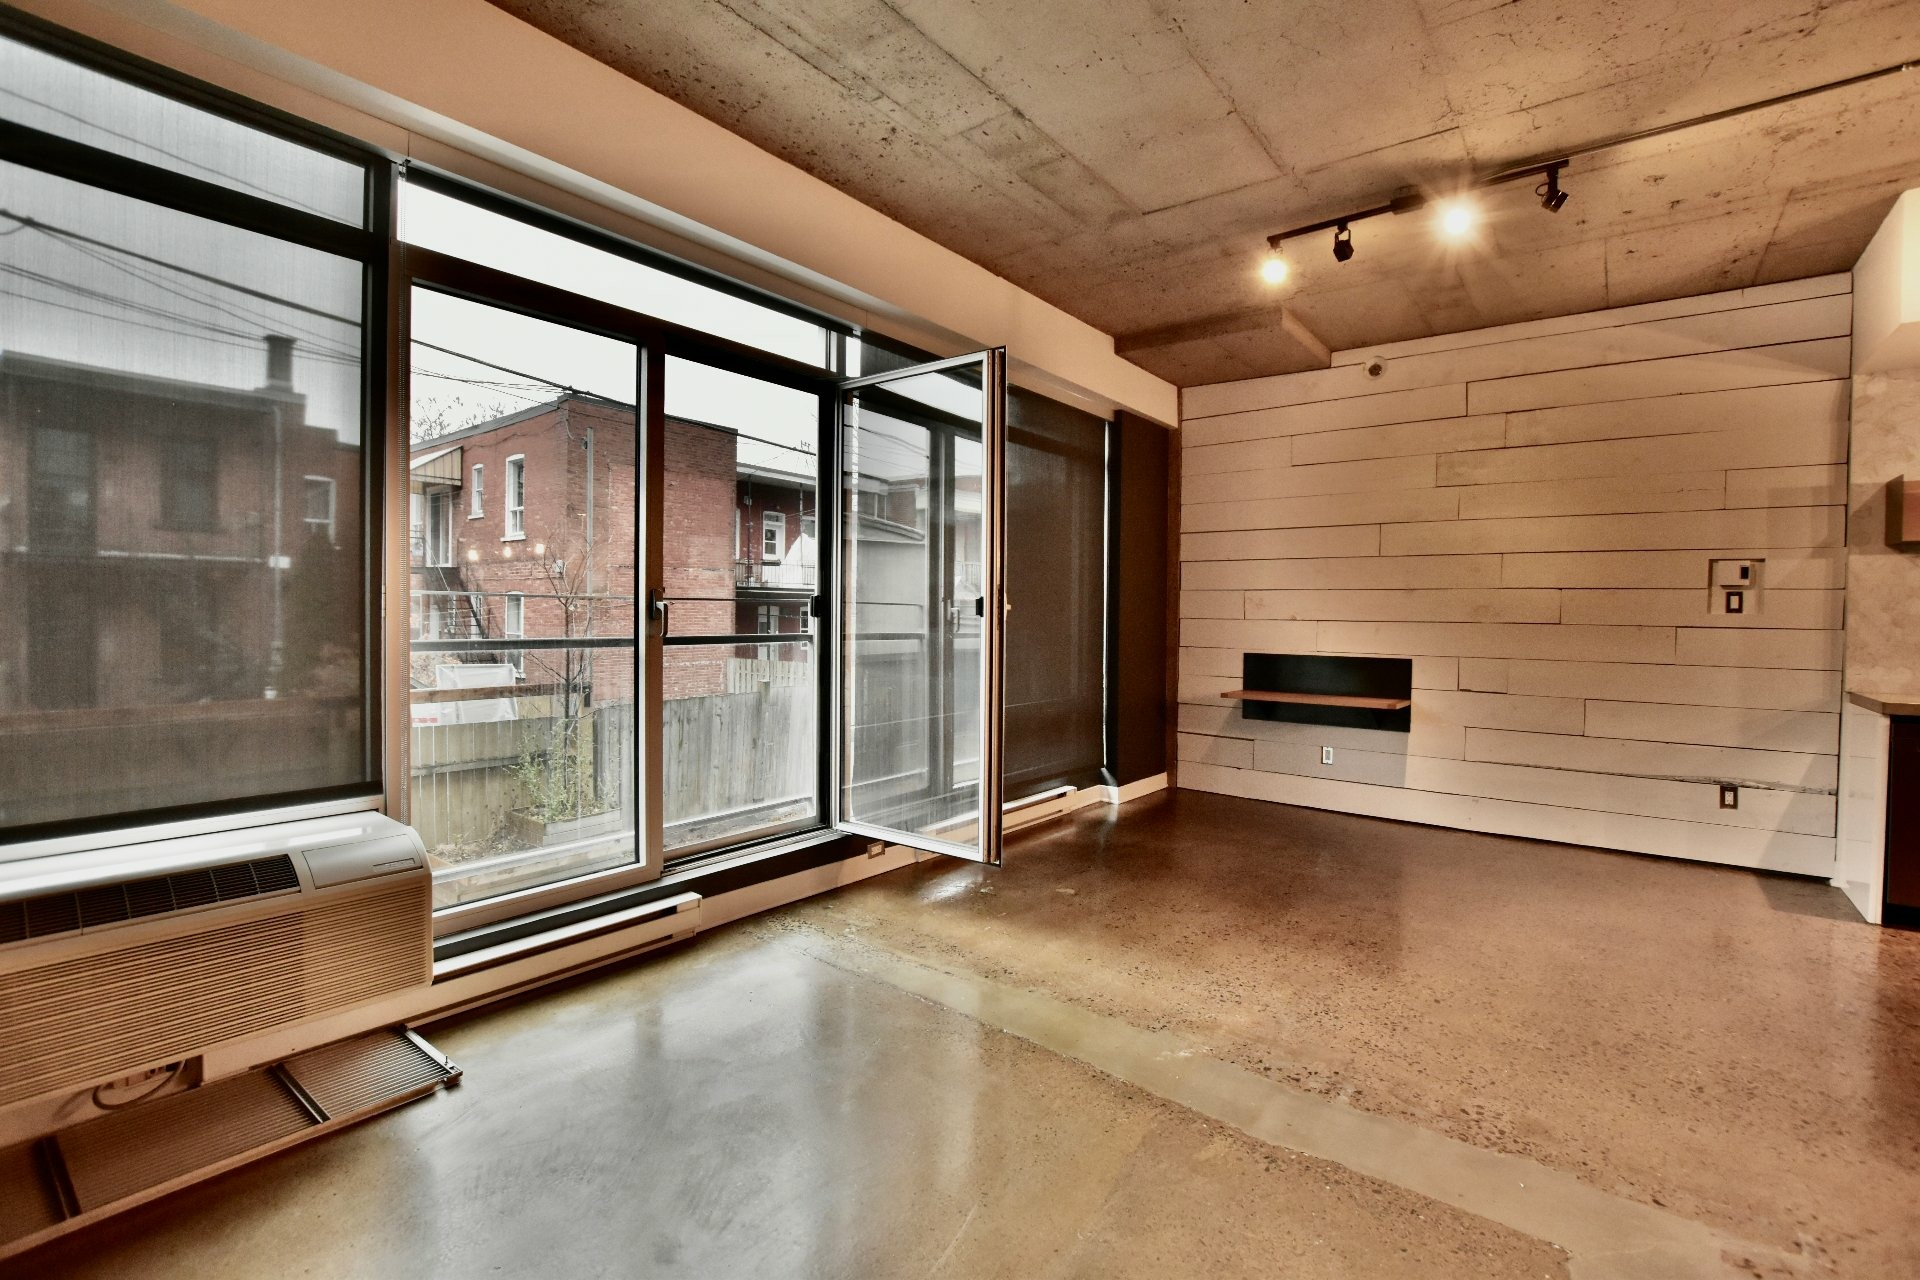 image 36 - Departamento Para alquiler Villeray/Saint-Michel/Parc-Extension Montréal  - 5 habitaciones